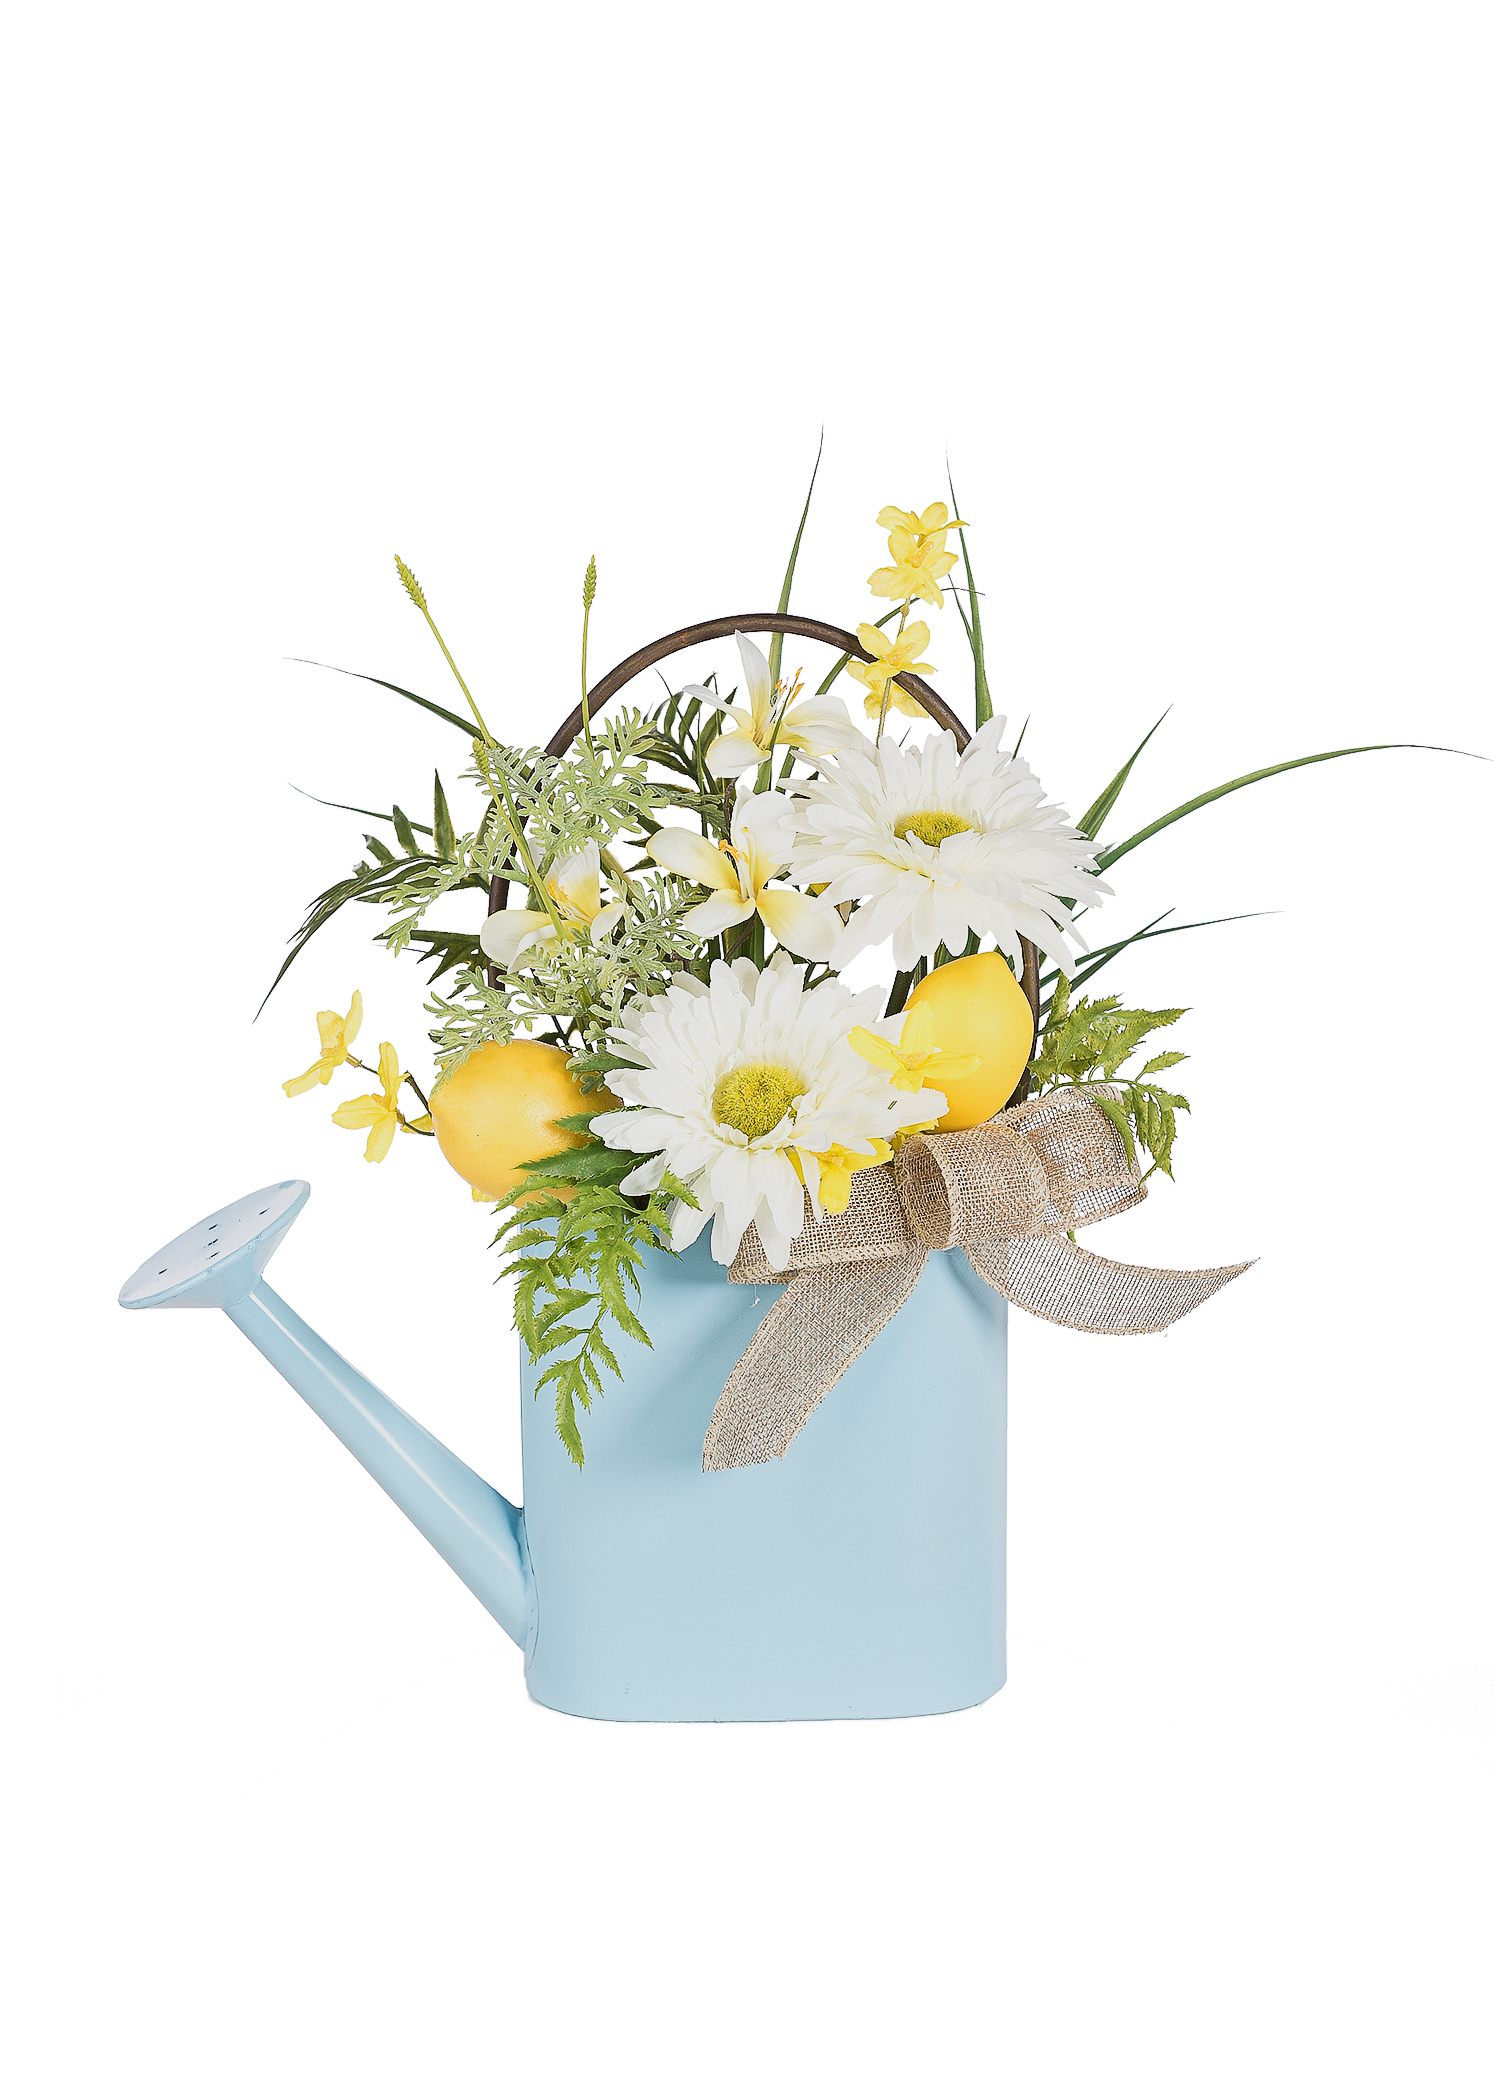 Spring Blue Watering Can with Lemons PartNumber: A015080163 KsnValue: 2654185 MfgPartNumber: NP17067-54